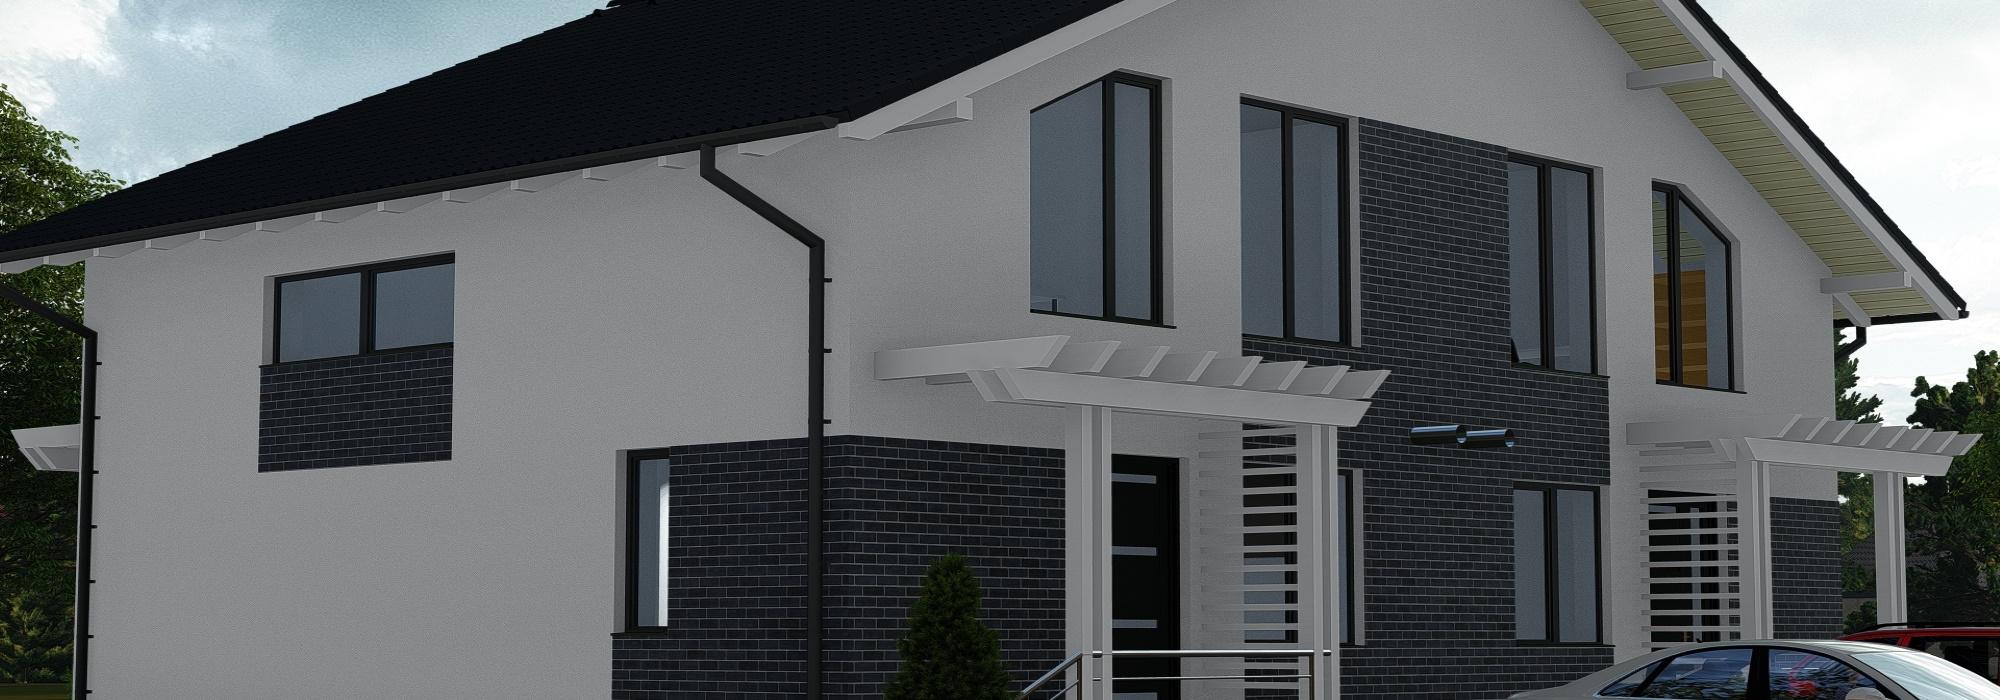 New Duplex House Assembly in Livezeni